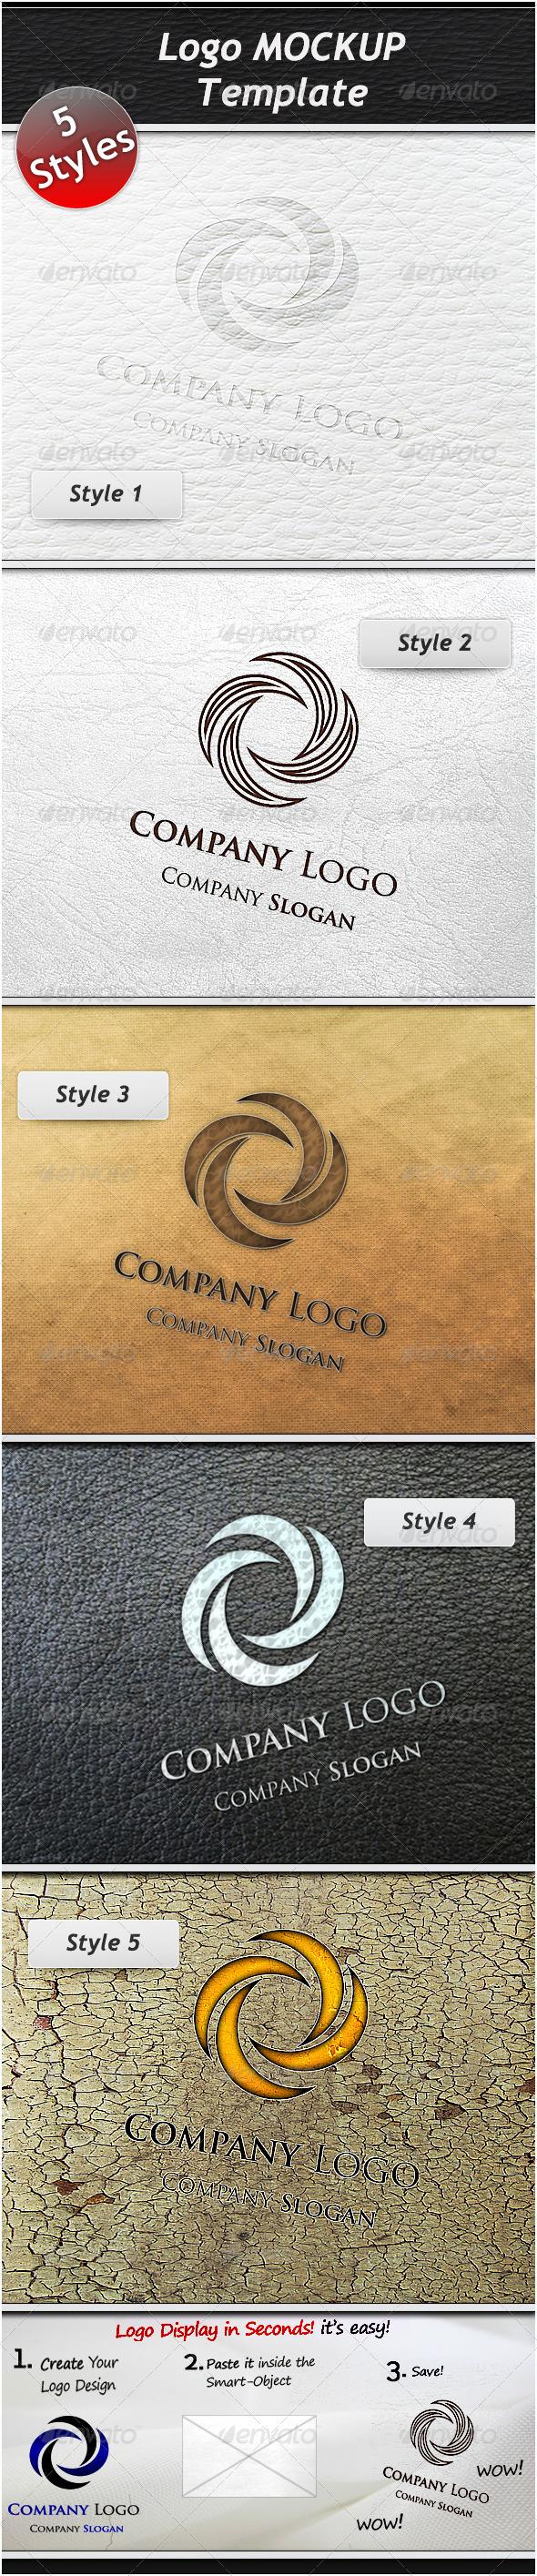 GraphicRiver Logo Mockup Template 1375146